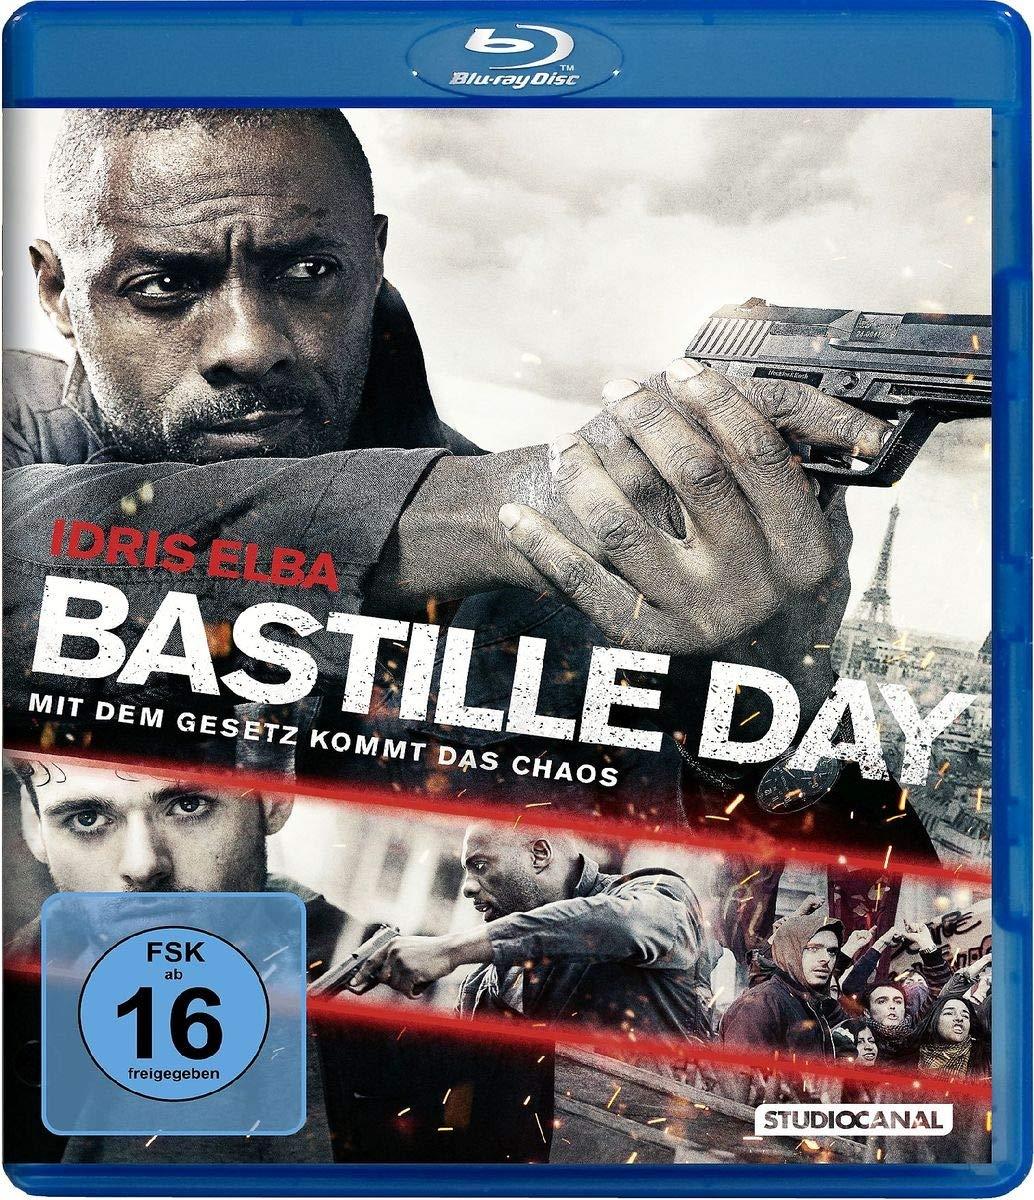 #506 Bastille Day